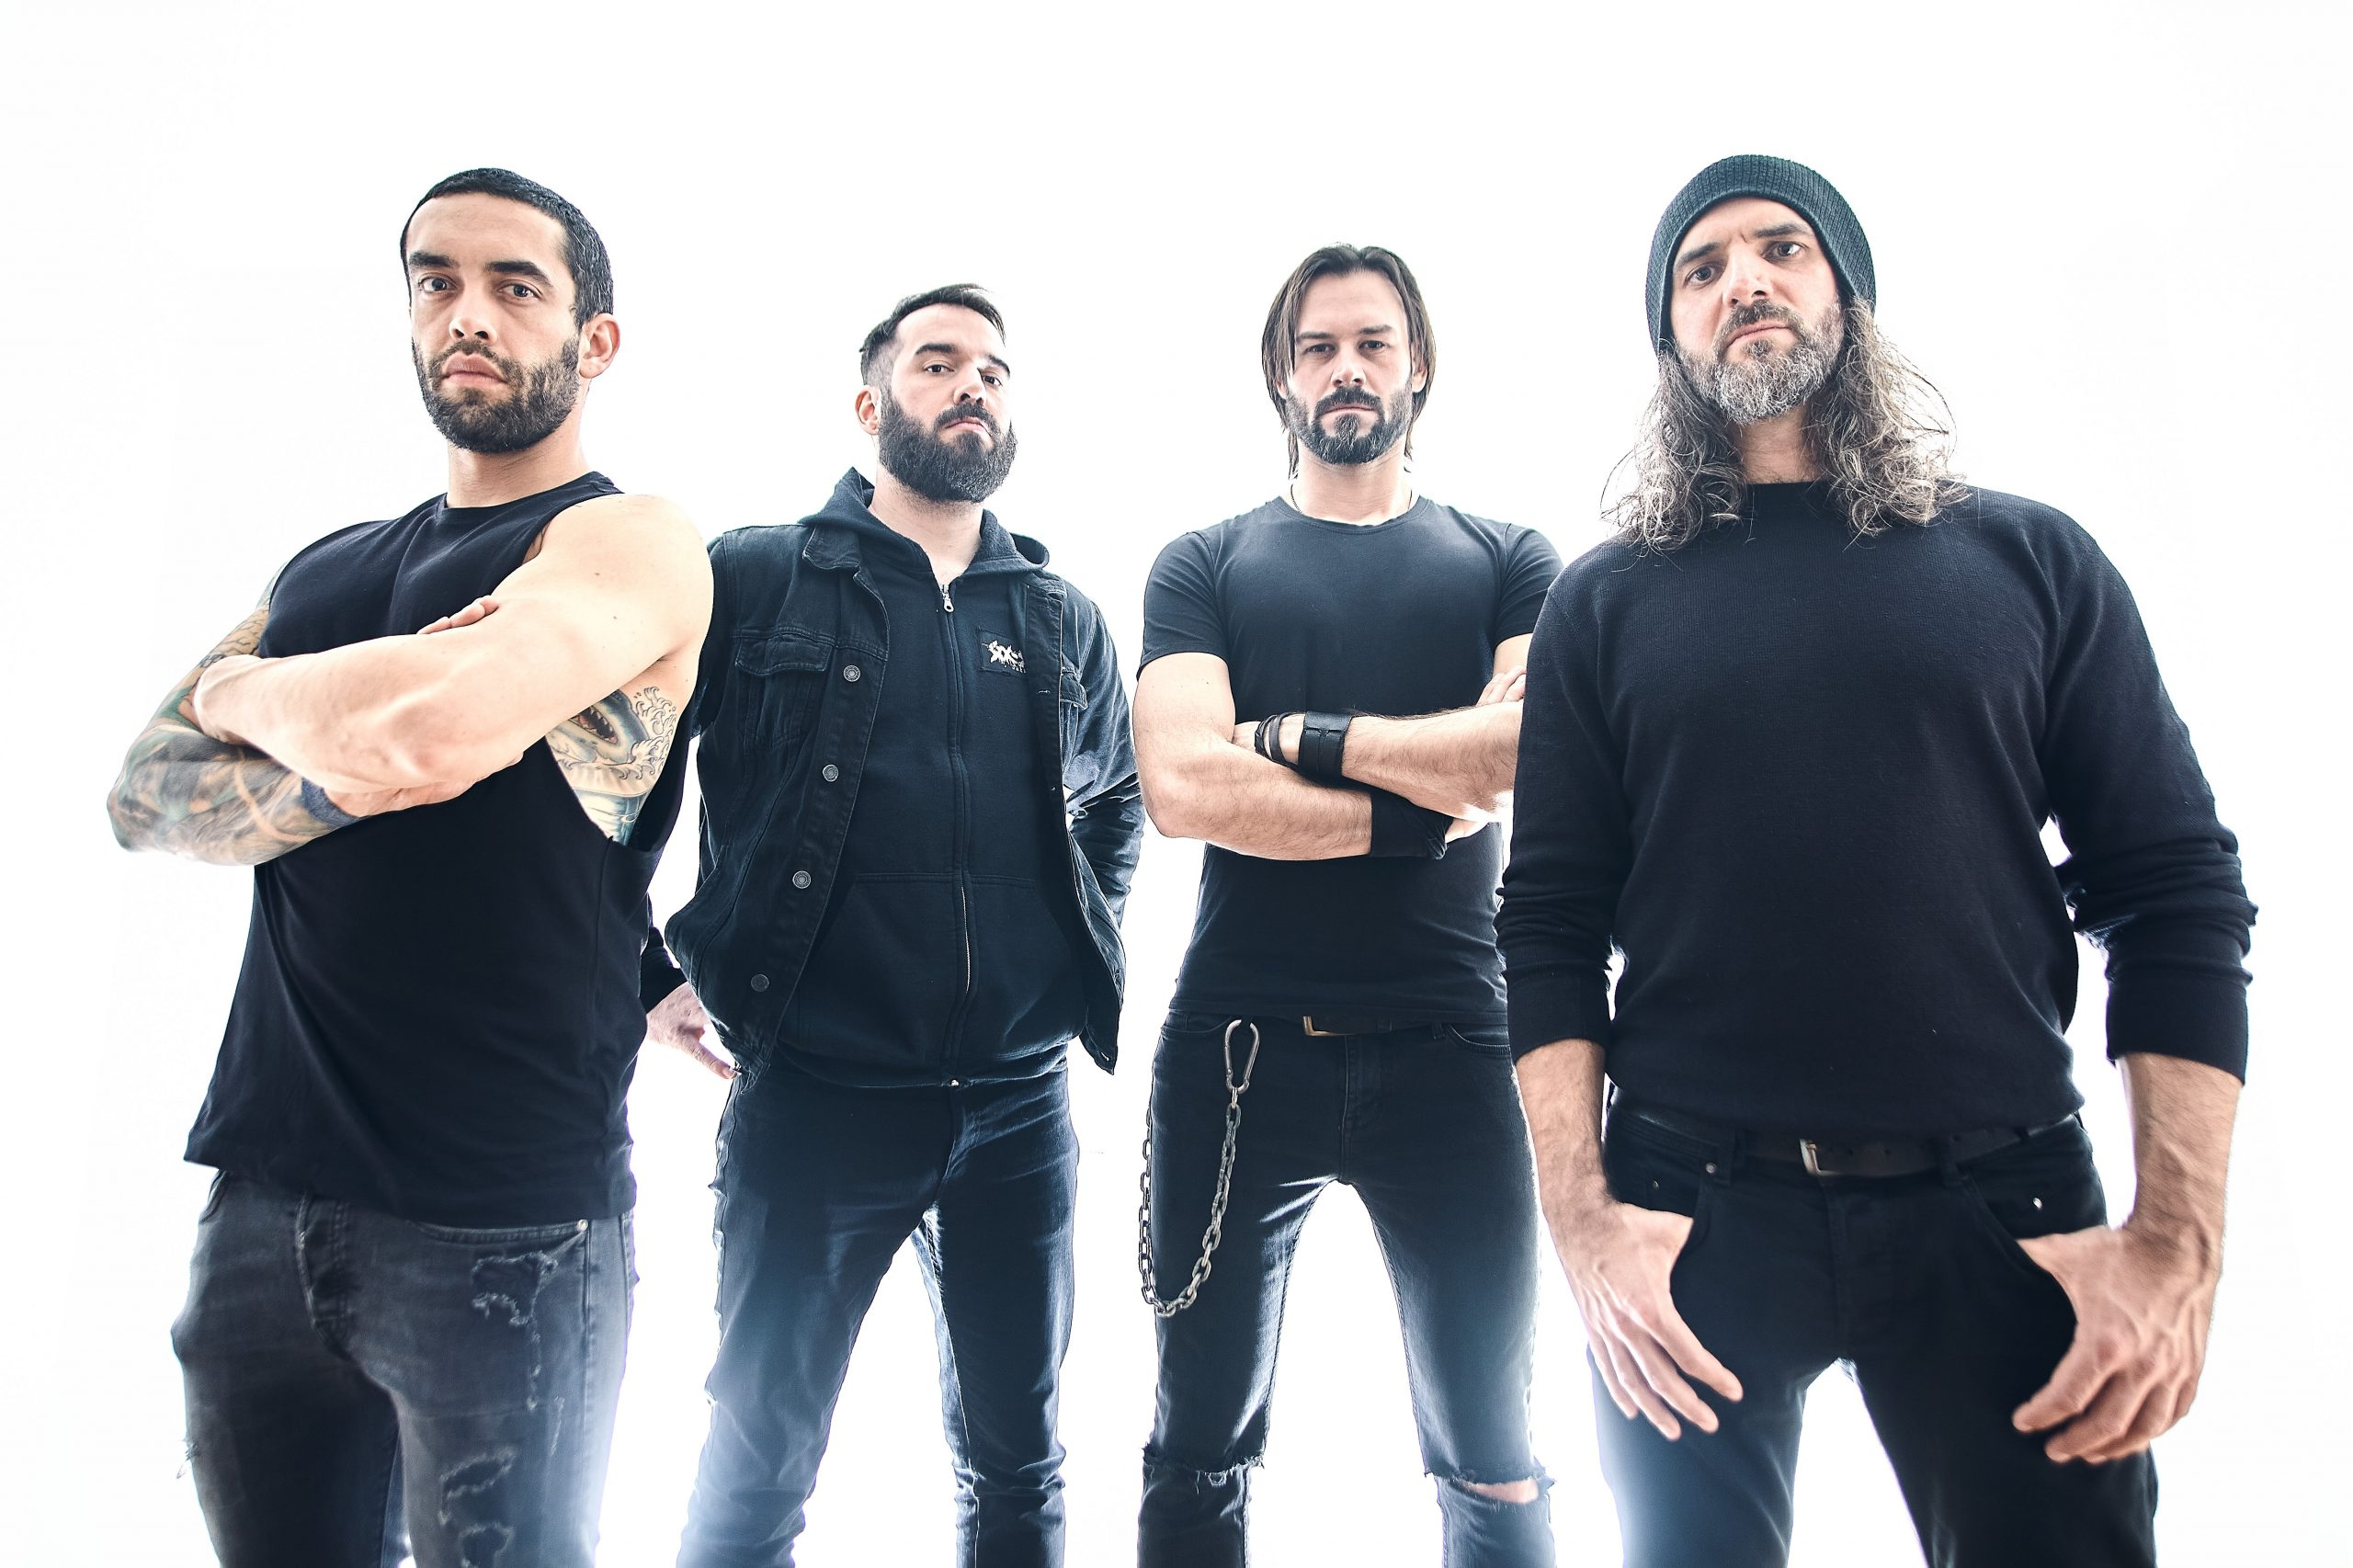 Black Inhale & Artas am 24. October 2020 @ Szene Wien.